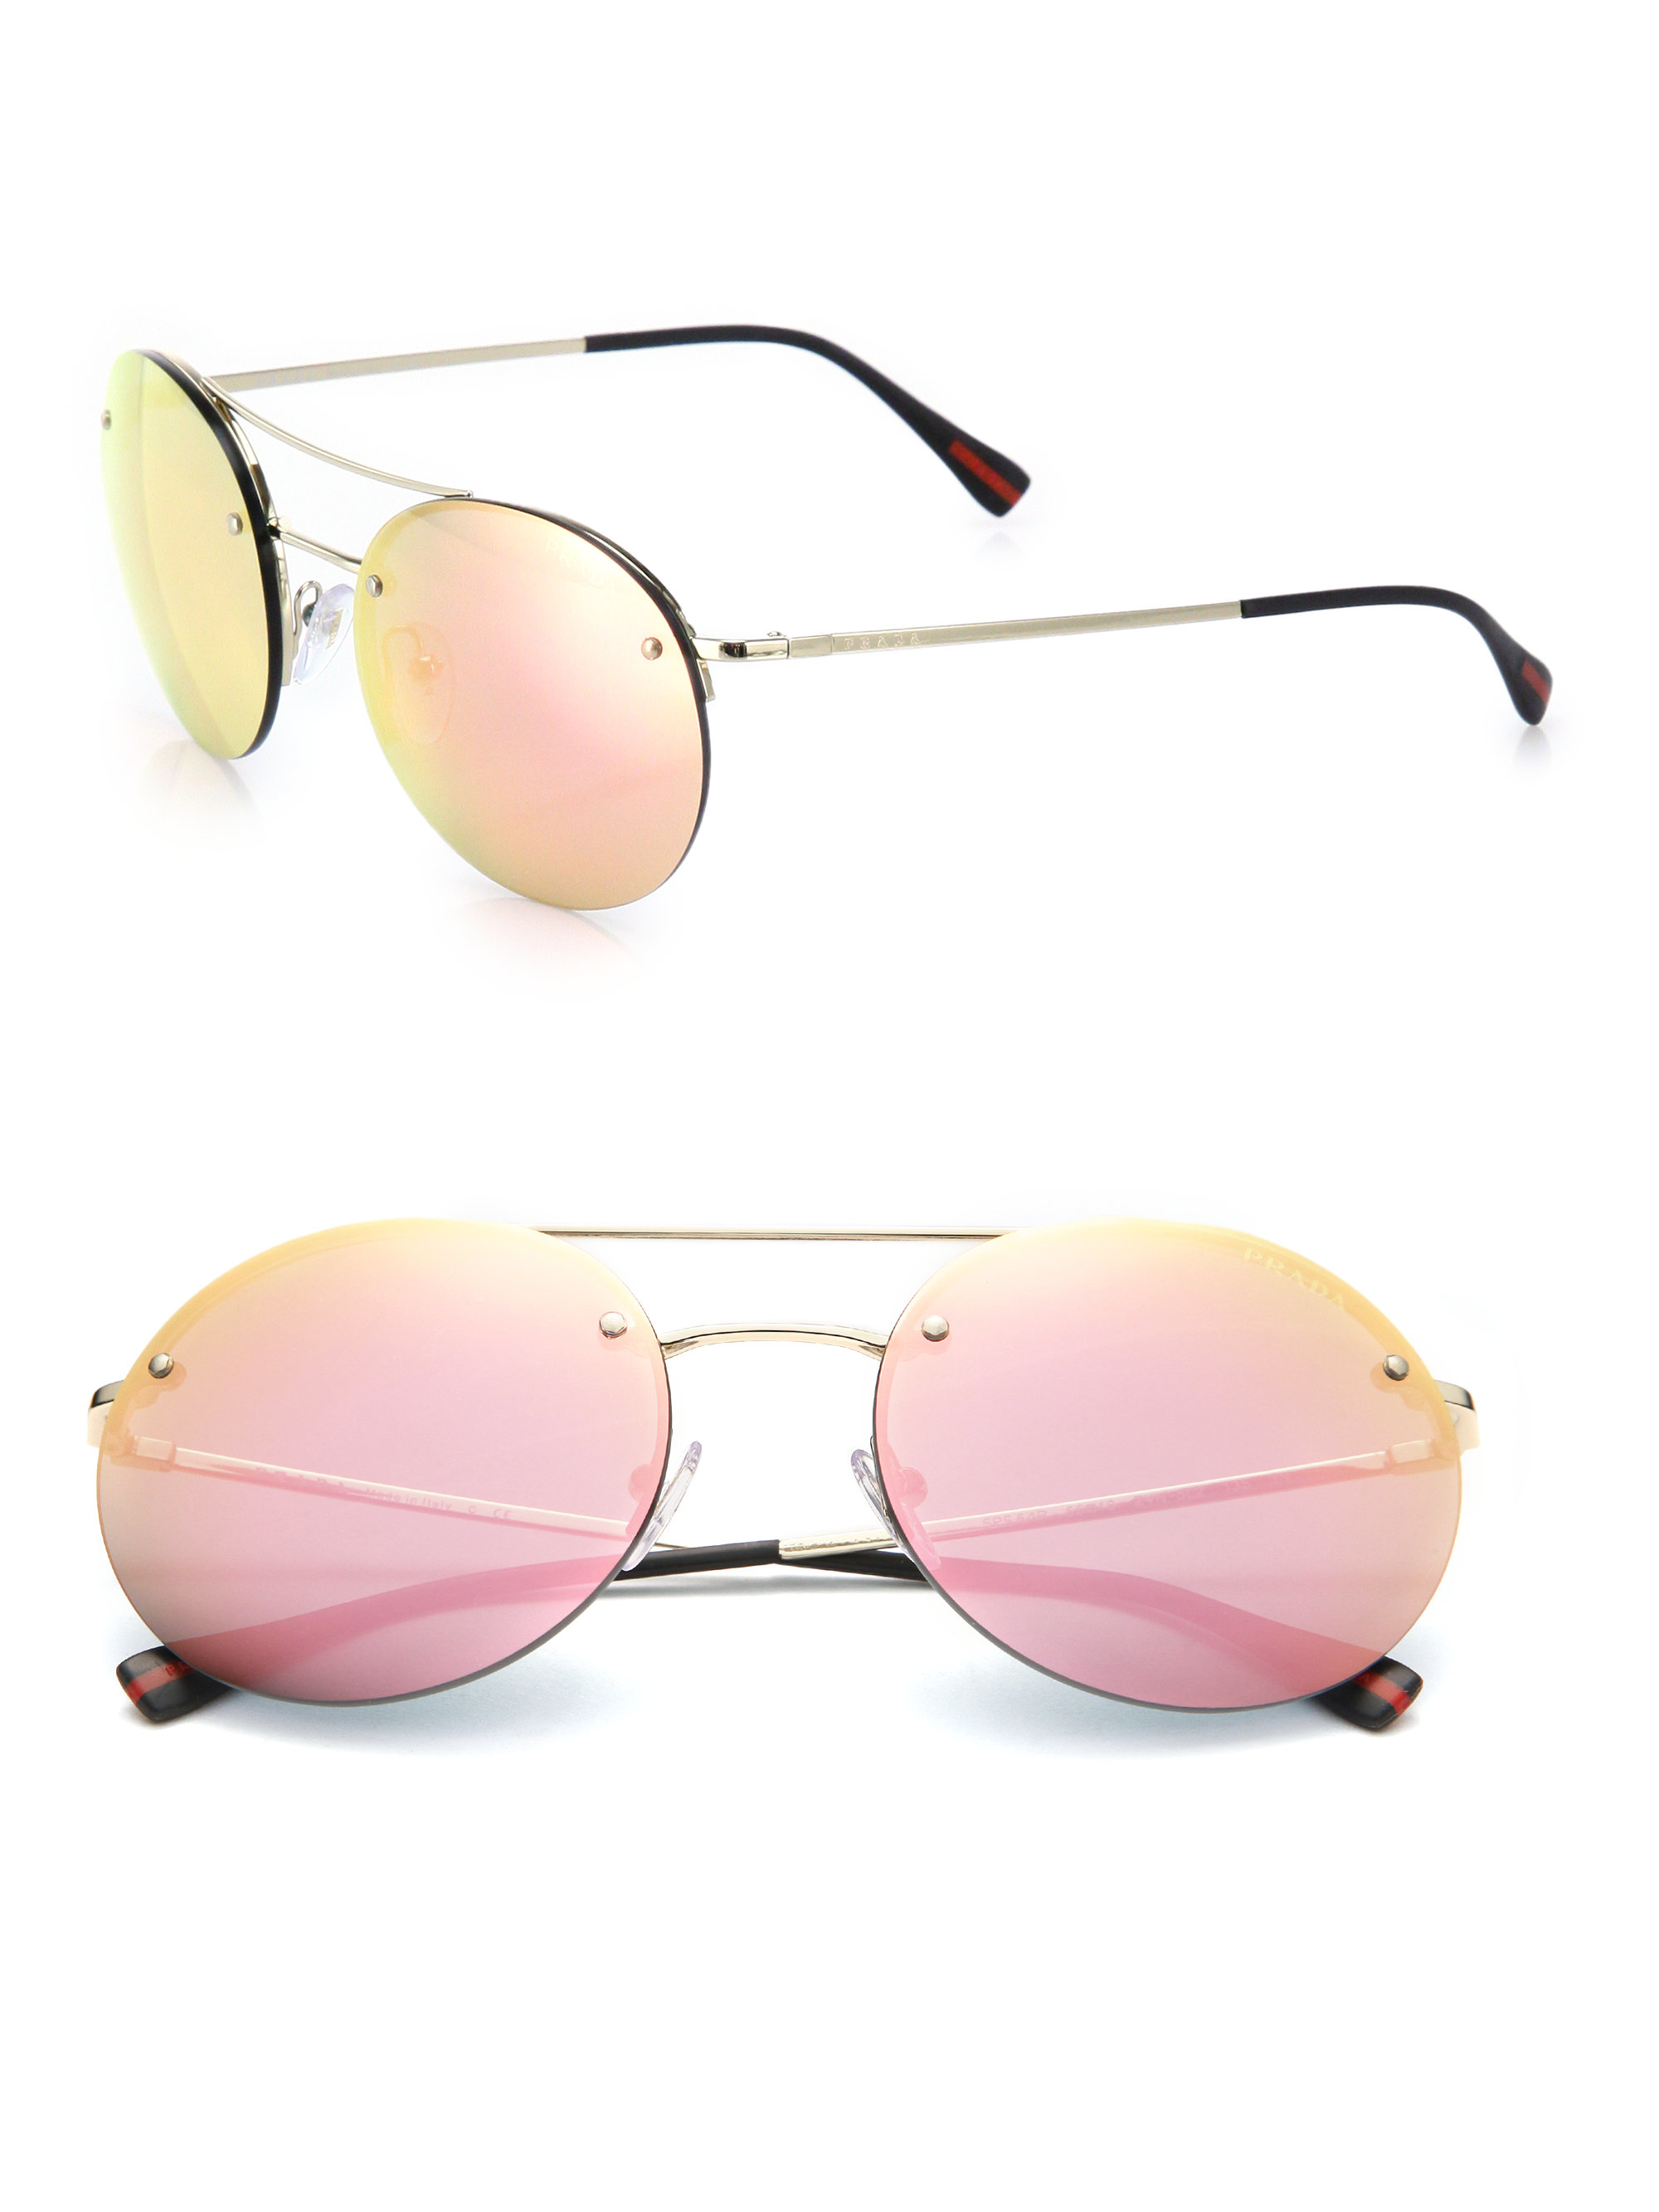 4ca55f2e3f3 ... promo code for lyst prada 56mm round metal sunglasses in pink for men  59c3e eb69a